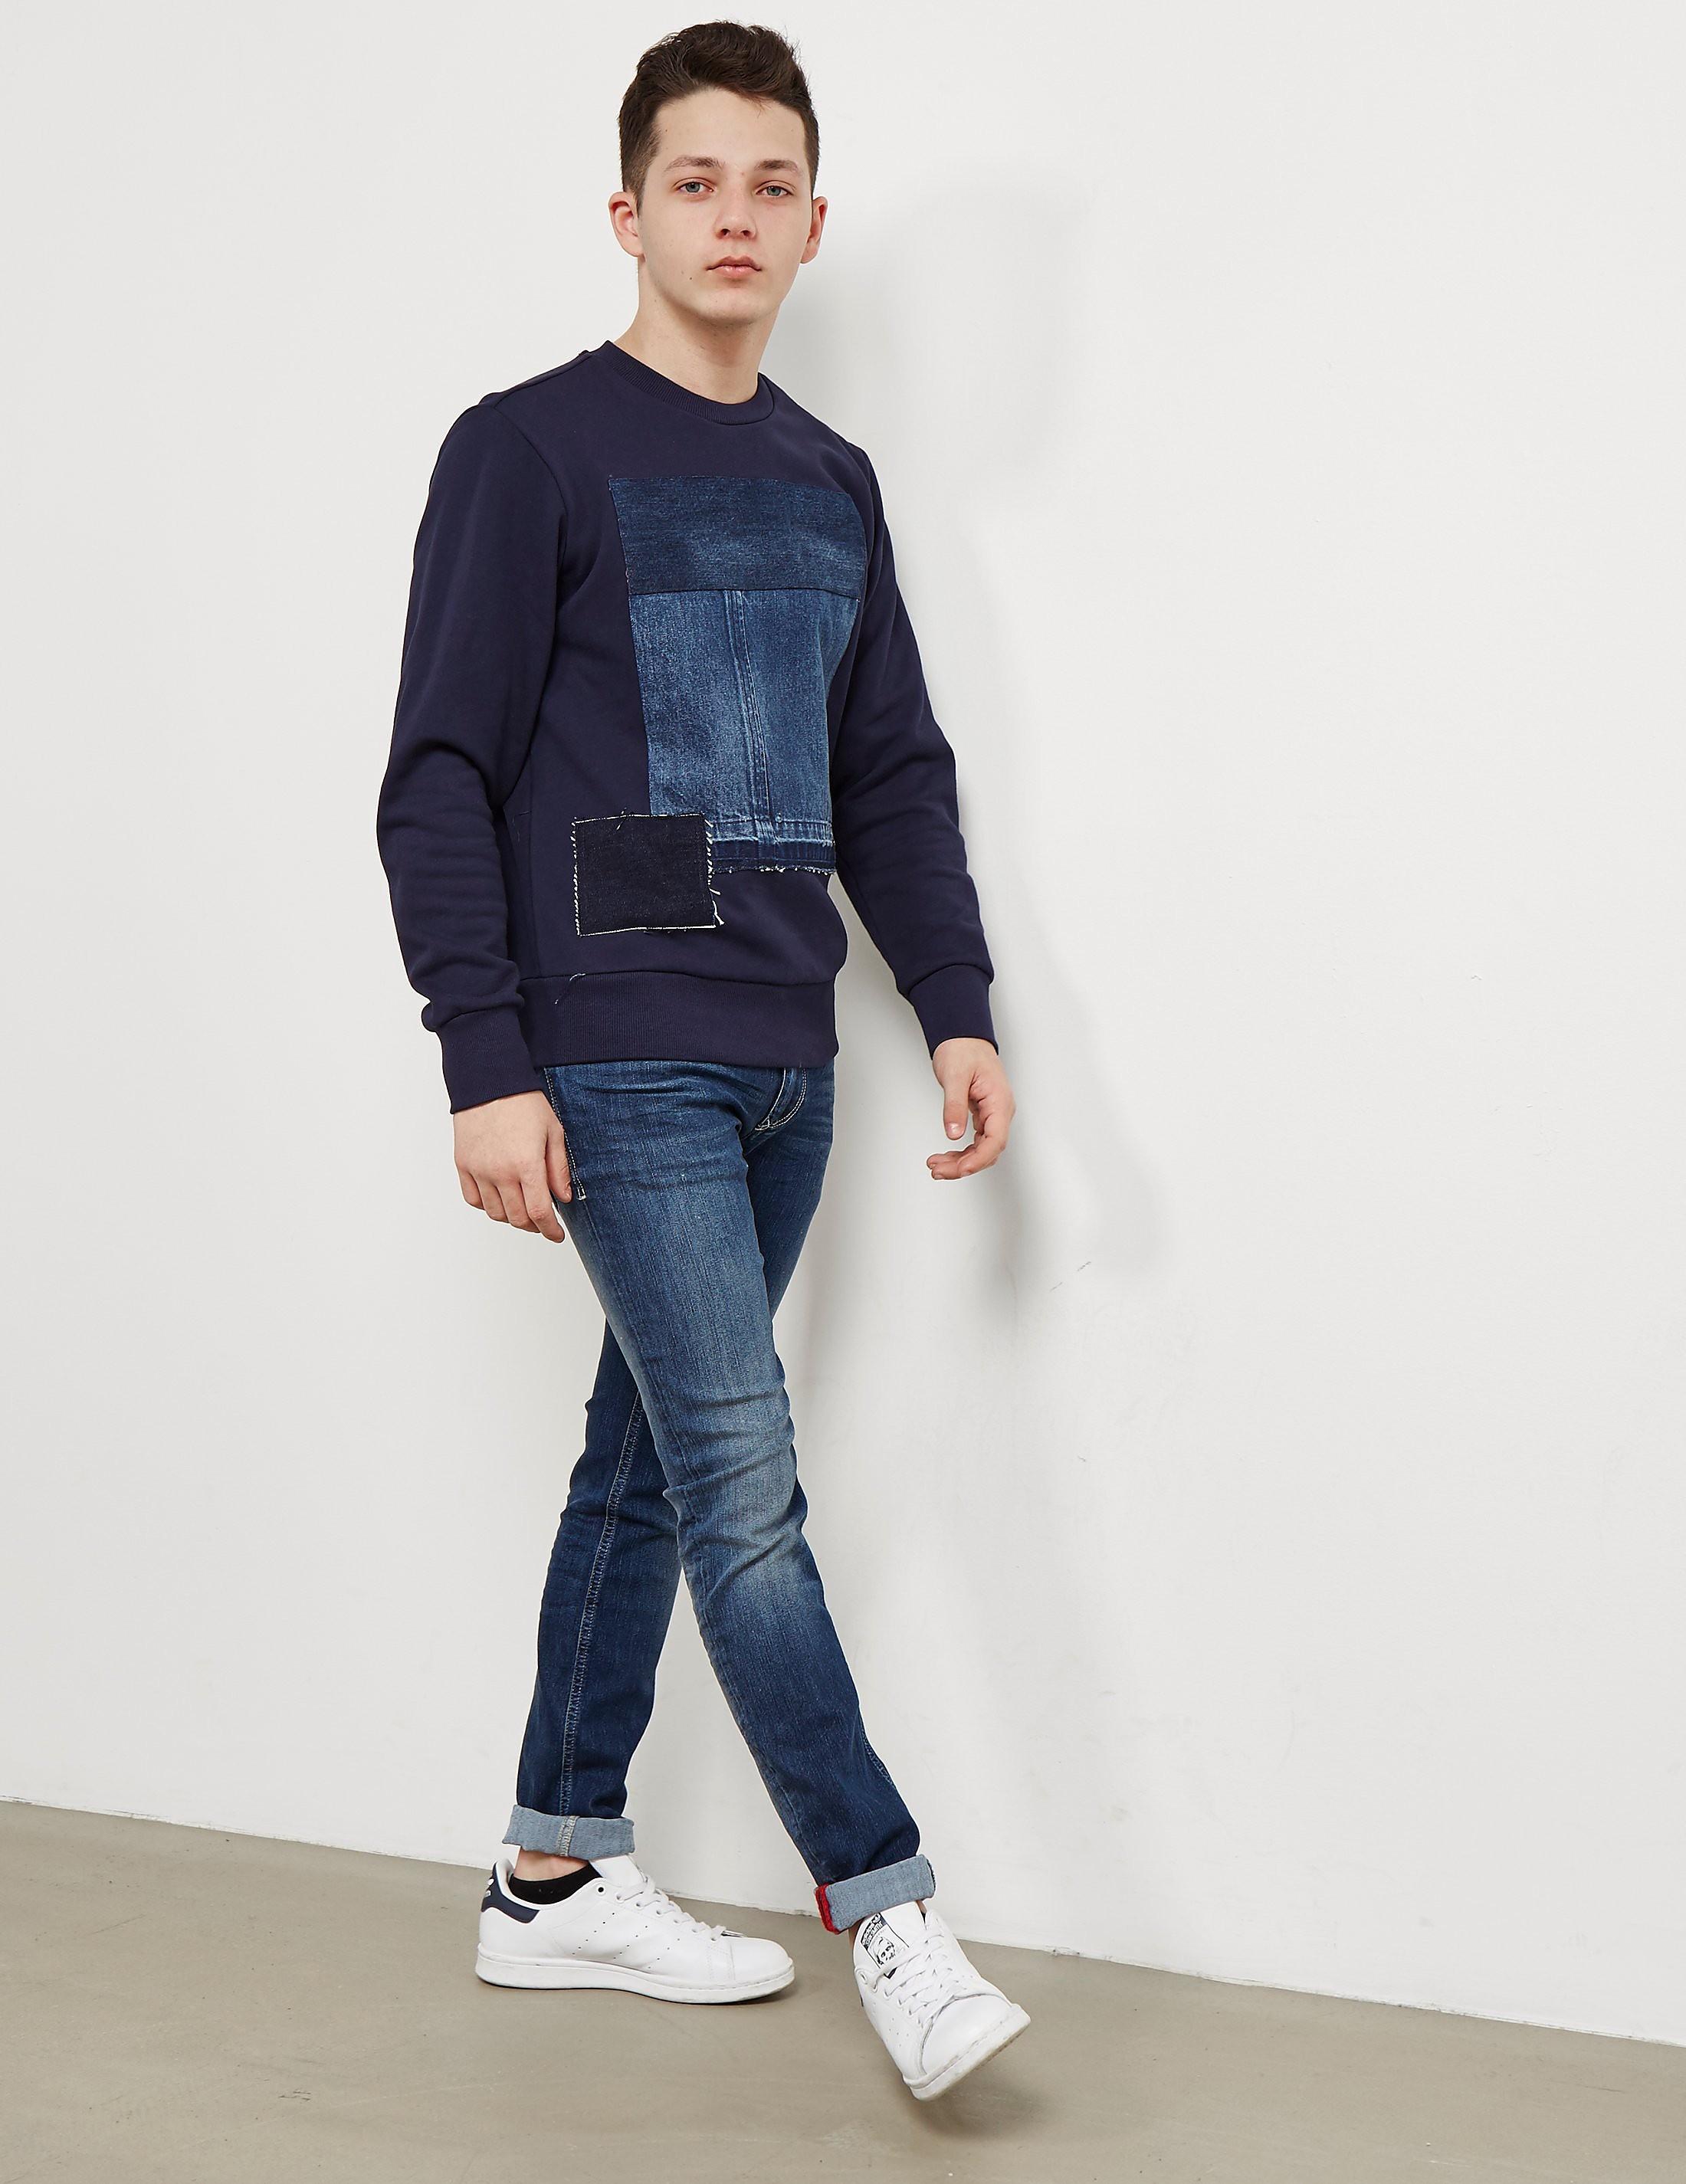 Diesel Patch Sweatshirt